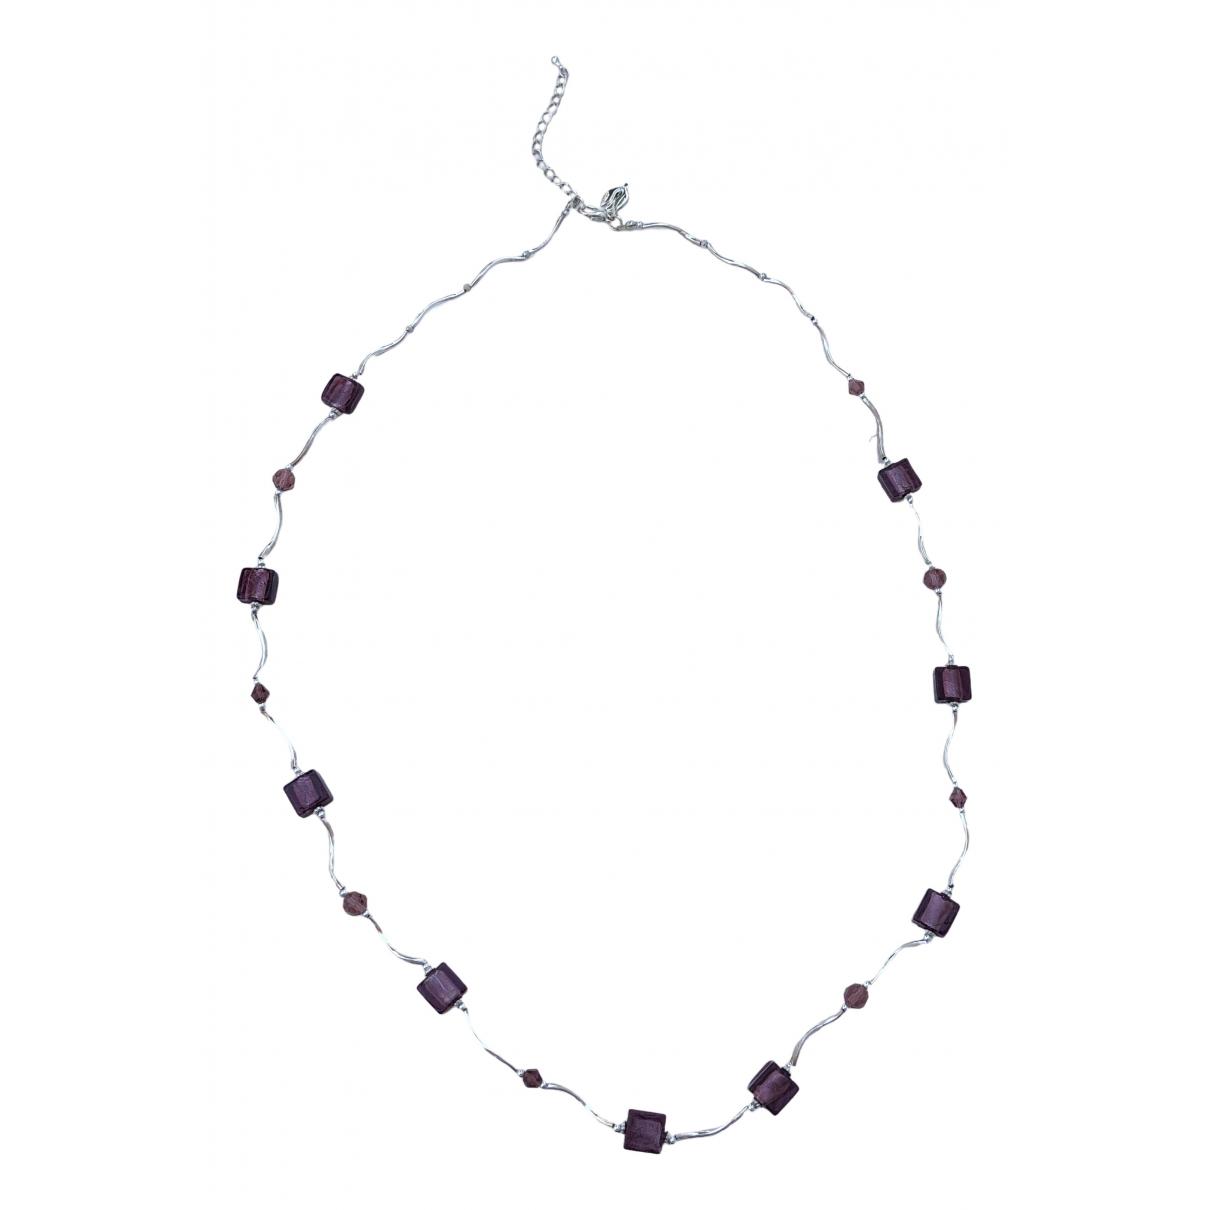 Collar largo Amethyste de Plata Non Signe / Unsigned